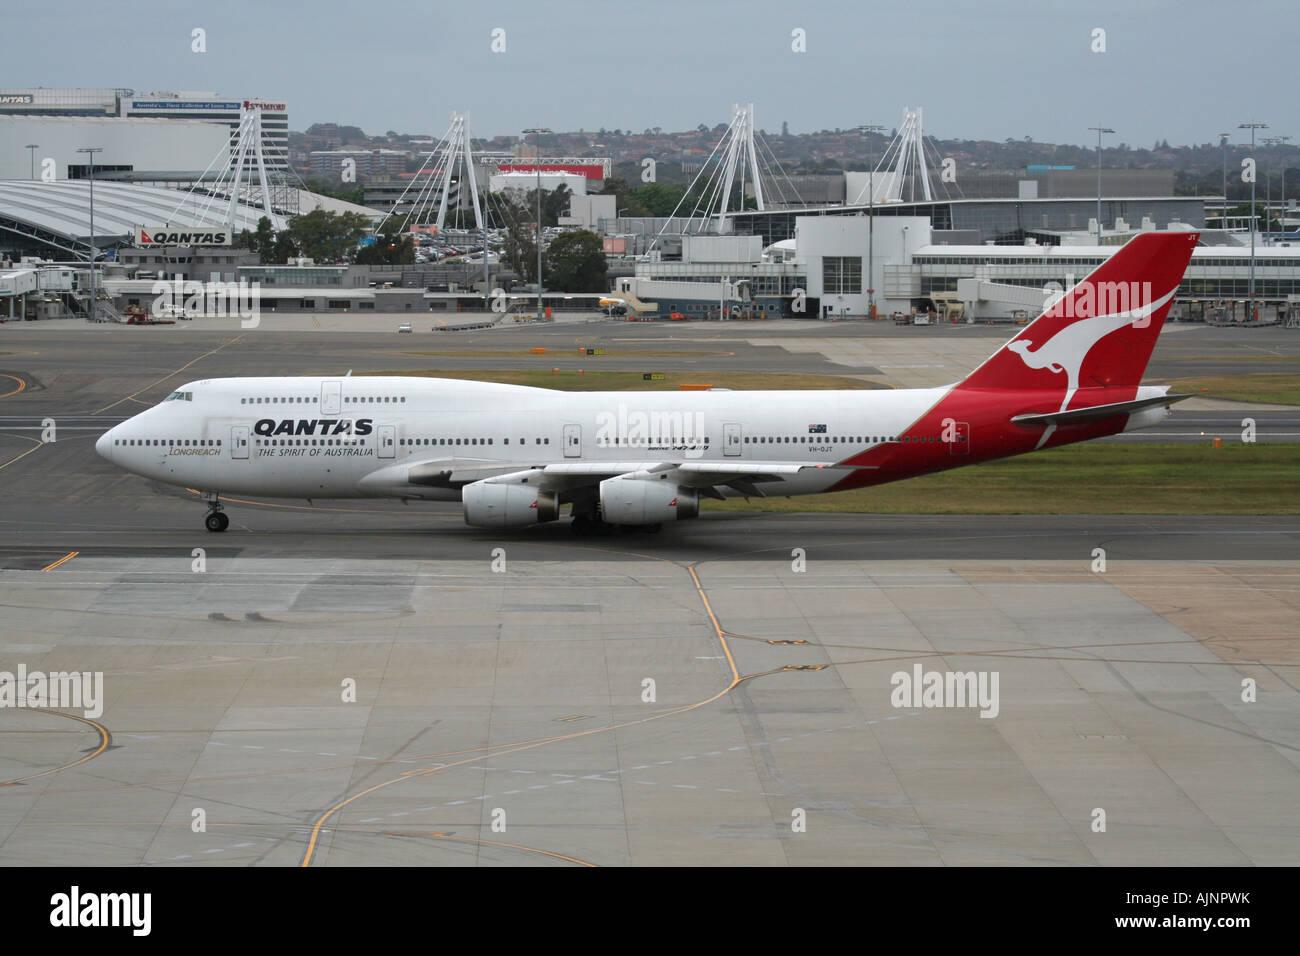 Qantas Boeing 747-400 at Sydney Airport, Australia - Stock Image